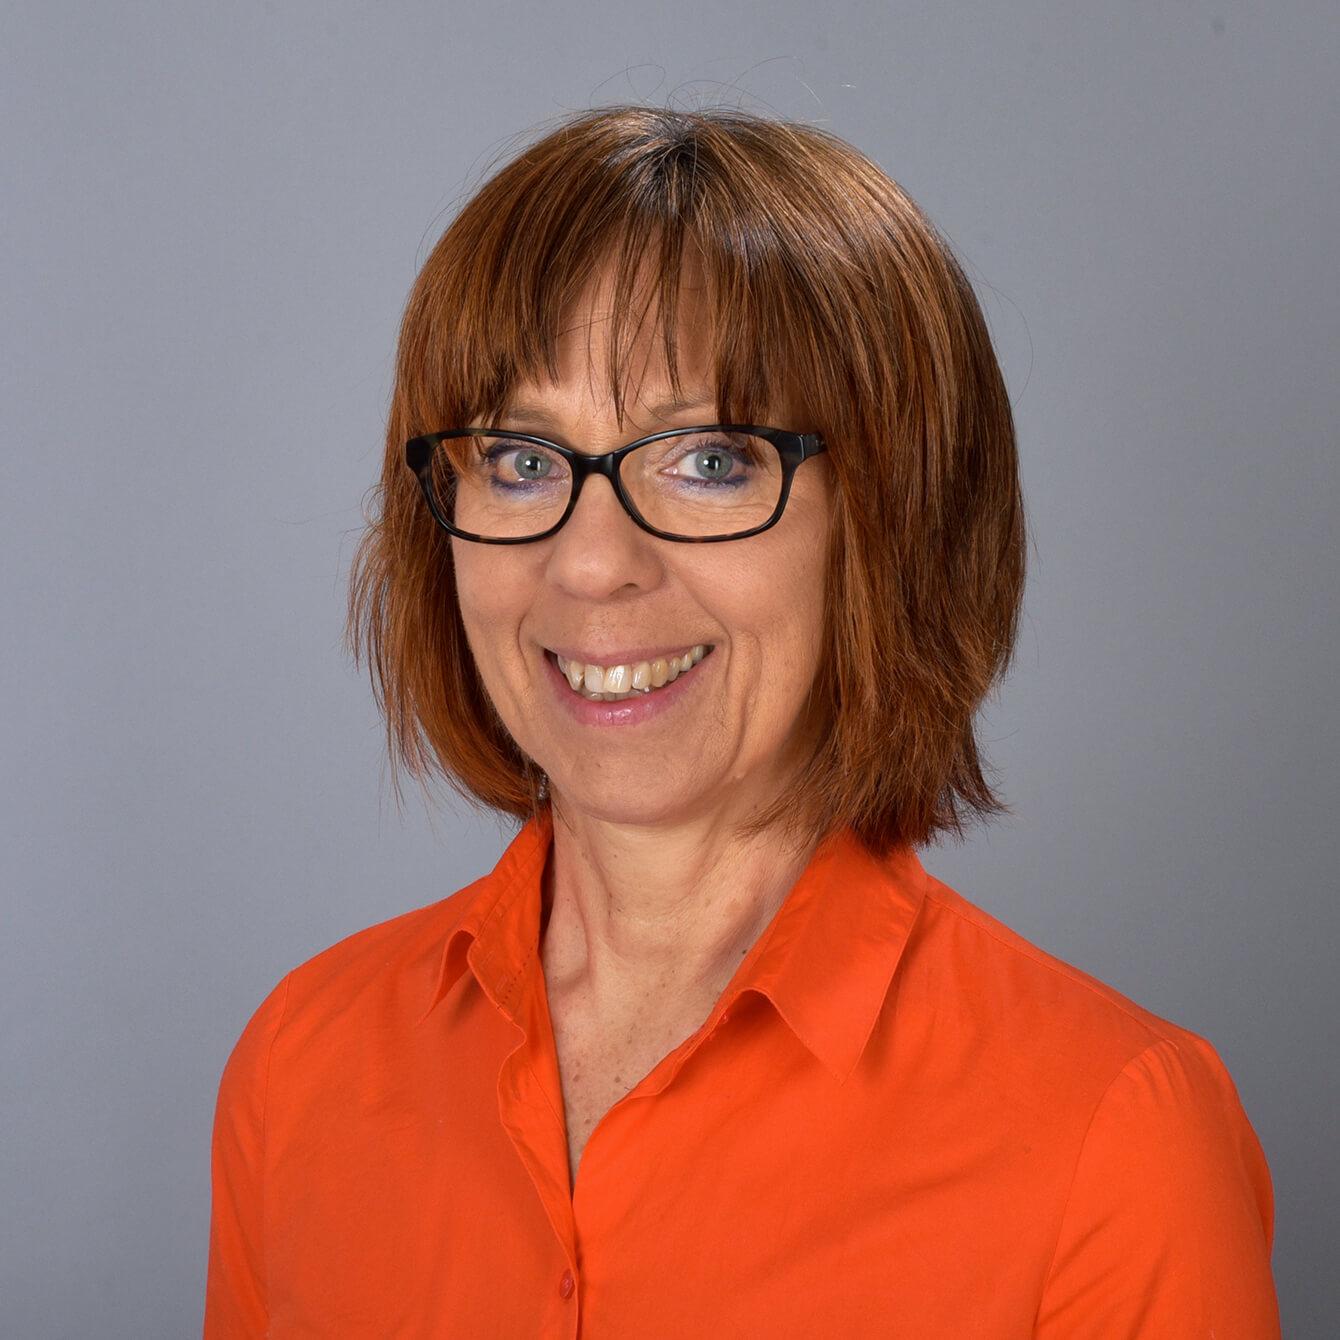 Claudine Villemot-Kienzle